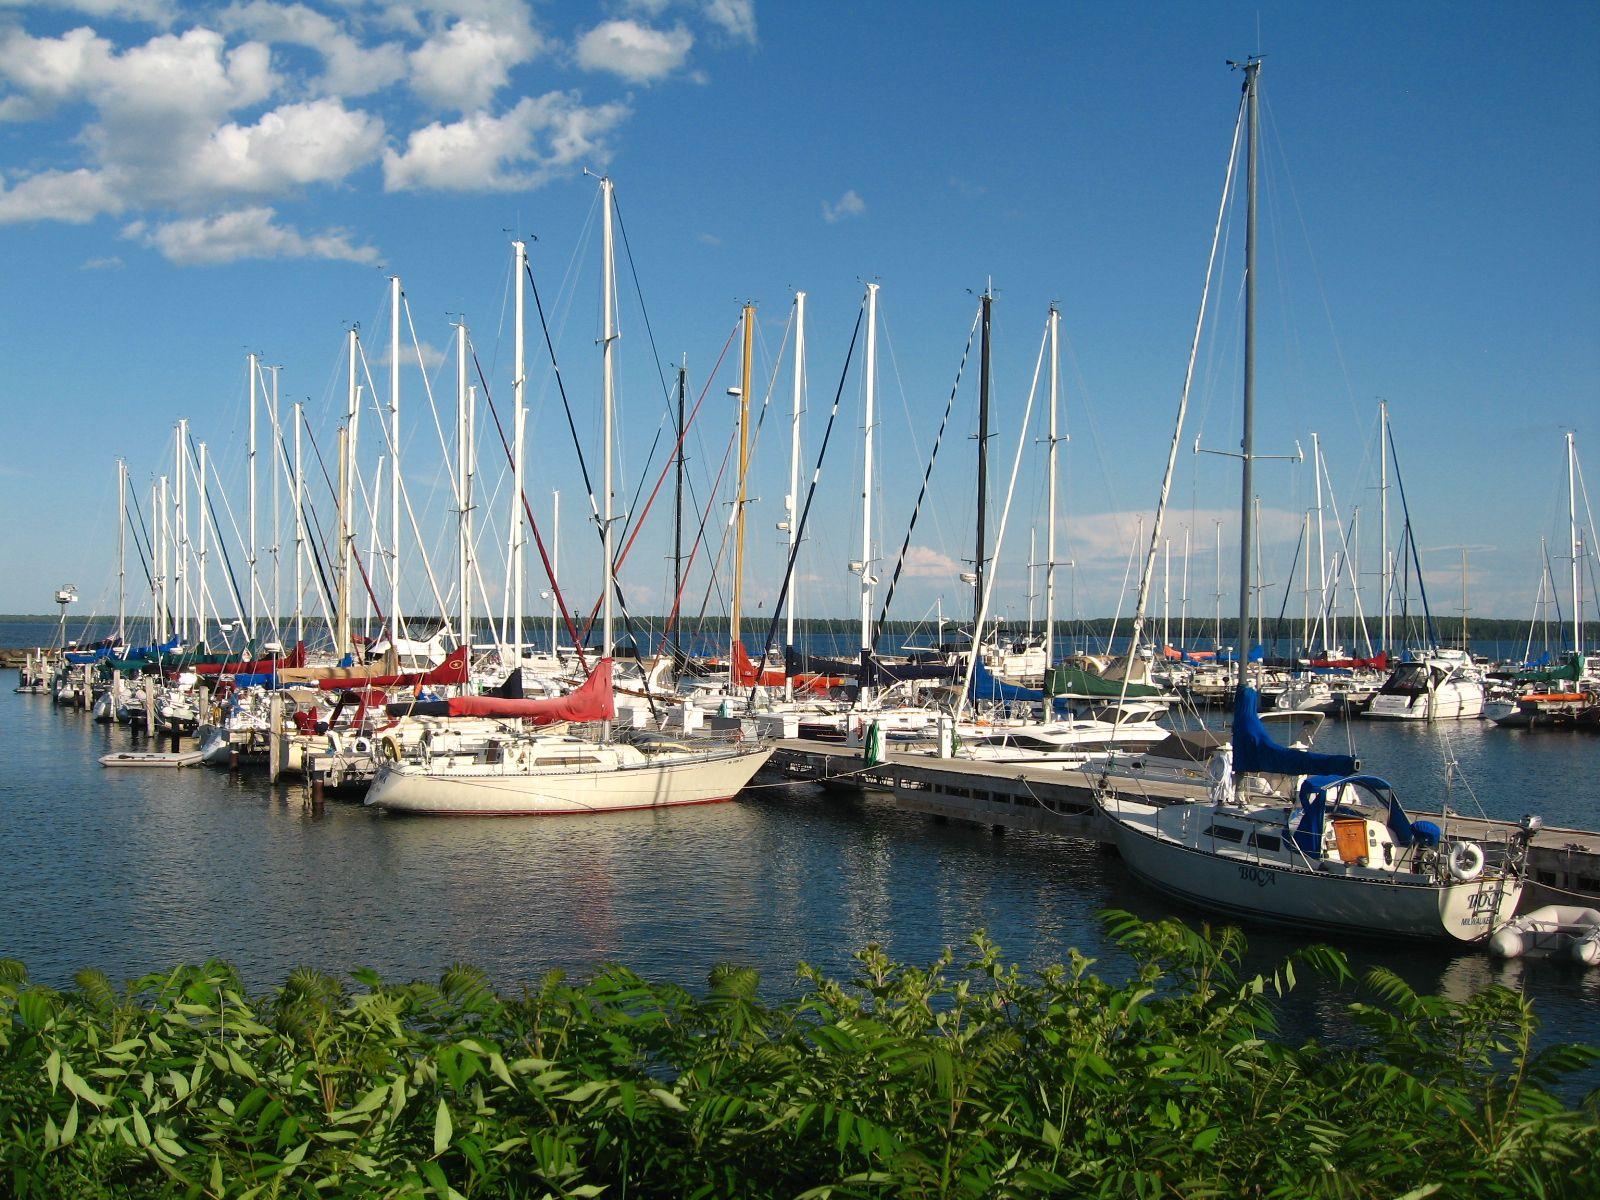 Marina Bayfield Wisconsin Favorite Photos I 39 Ve Taken Pinterest Wisconsin Wanderlust